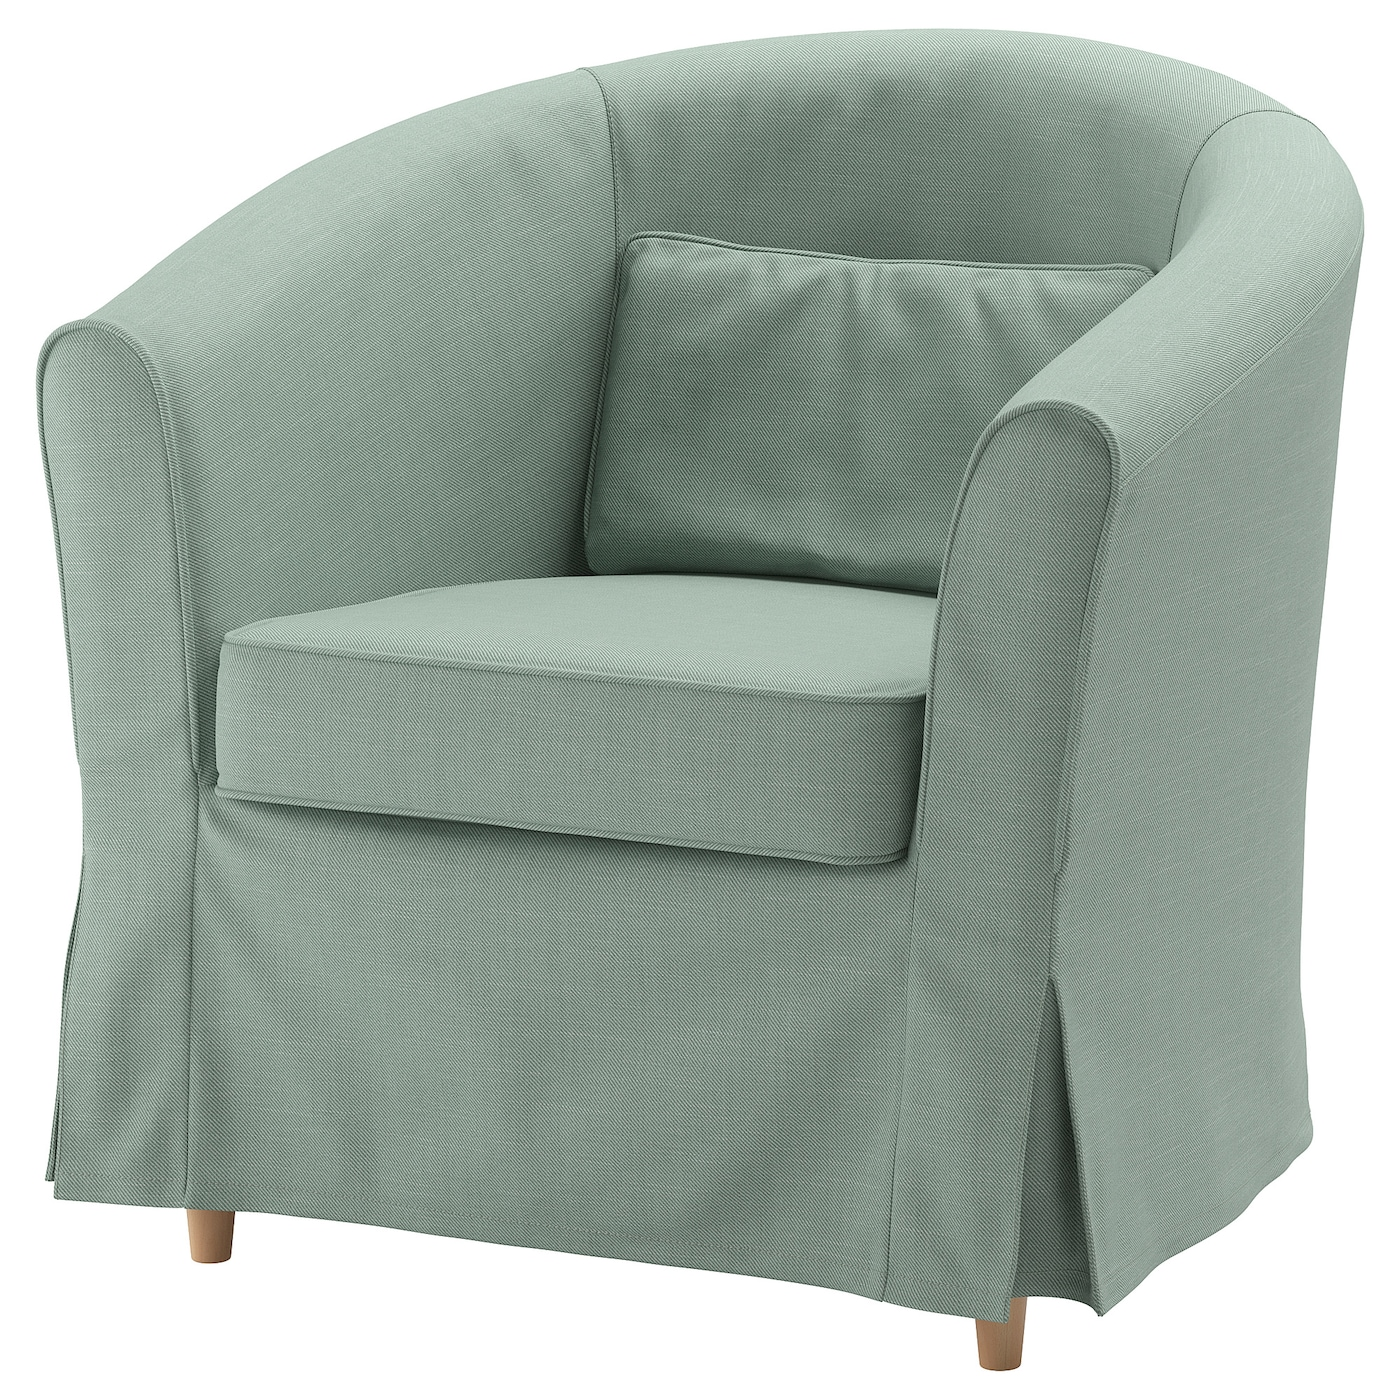 IKEA TULLSTA jasnozielony fotel